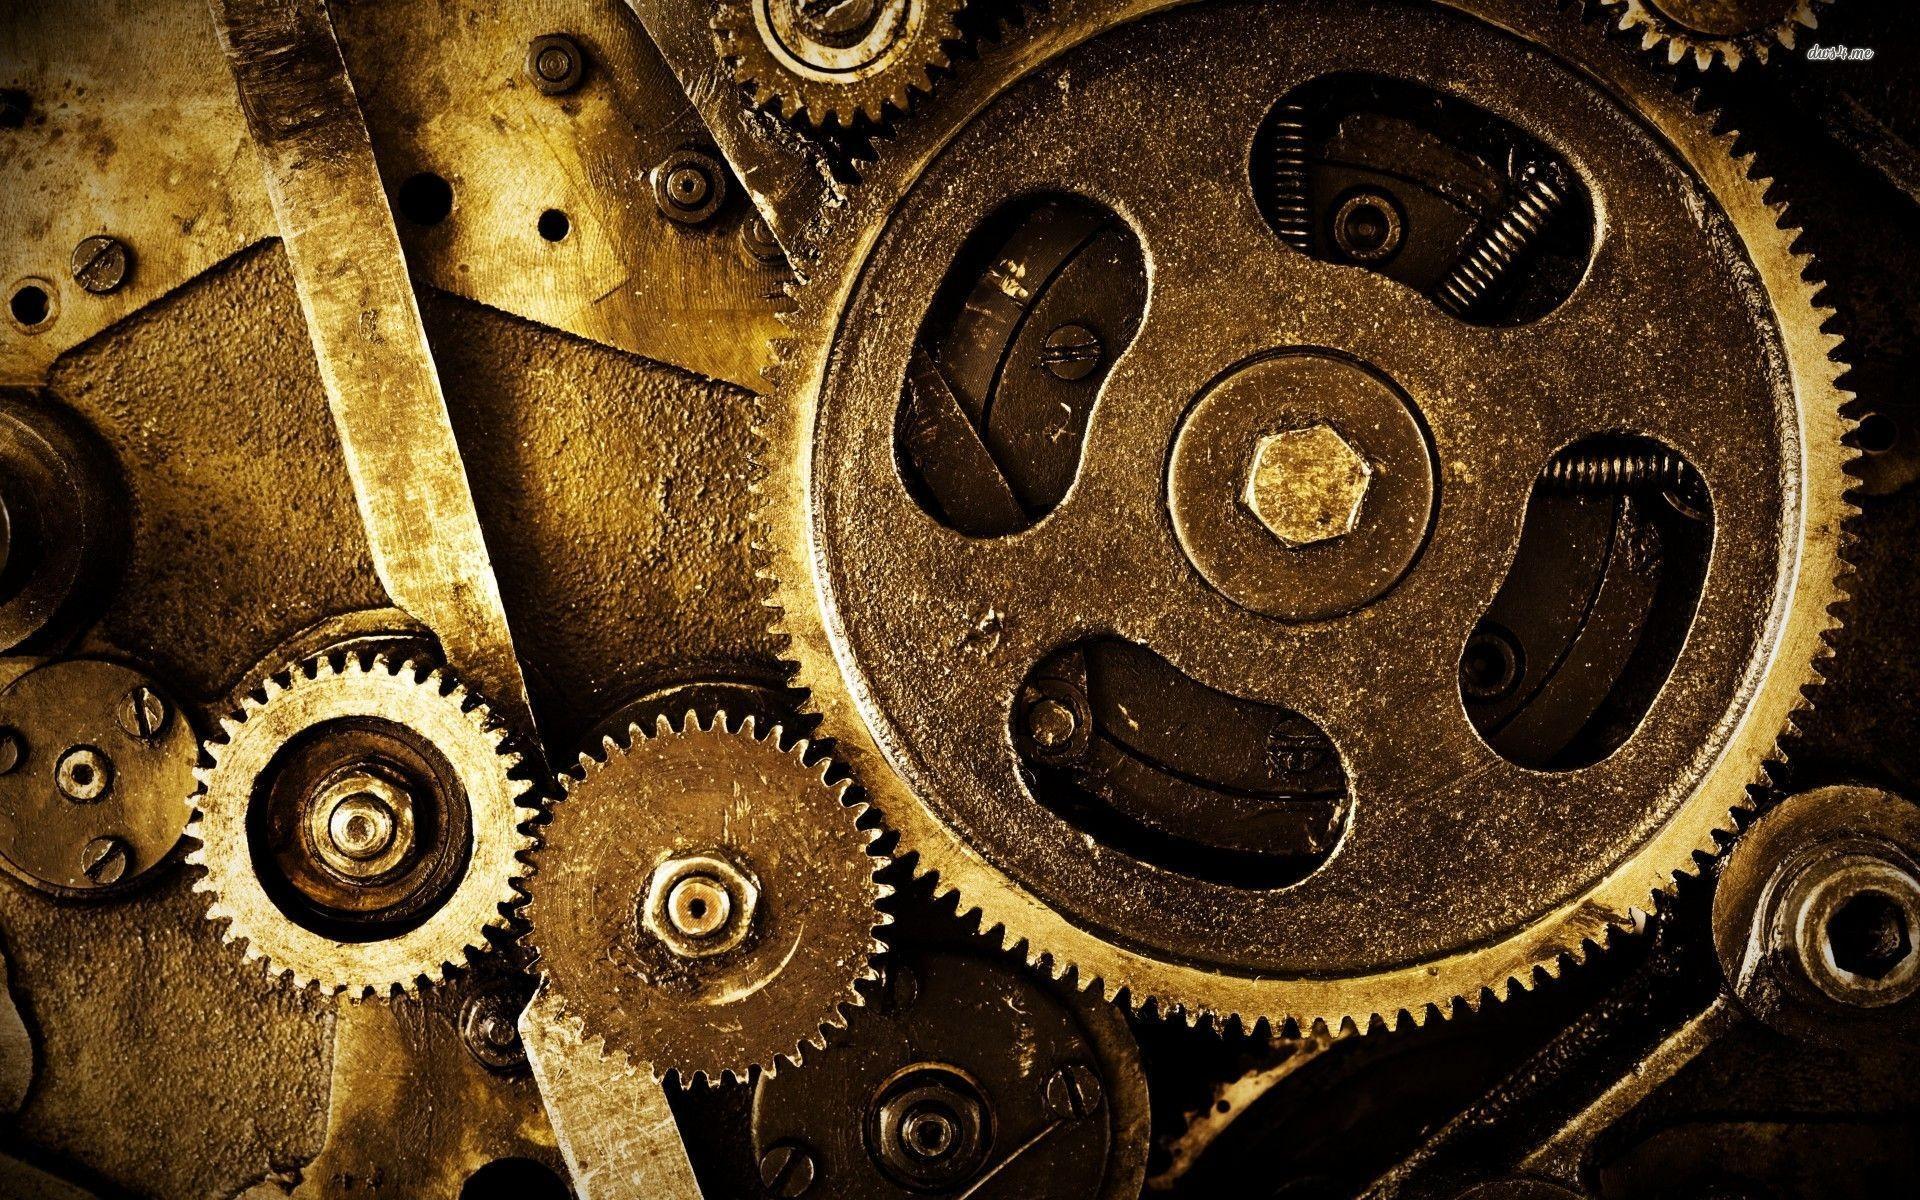 Mechanical Gears Wallpaper Hd Gears a machine is any device